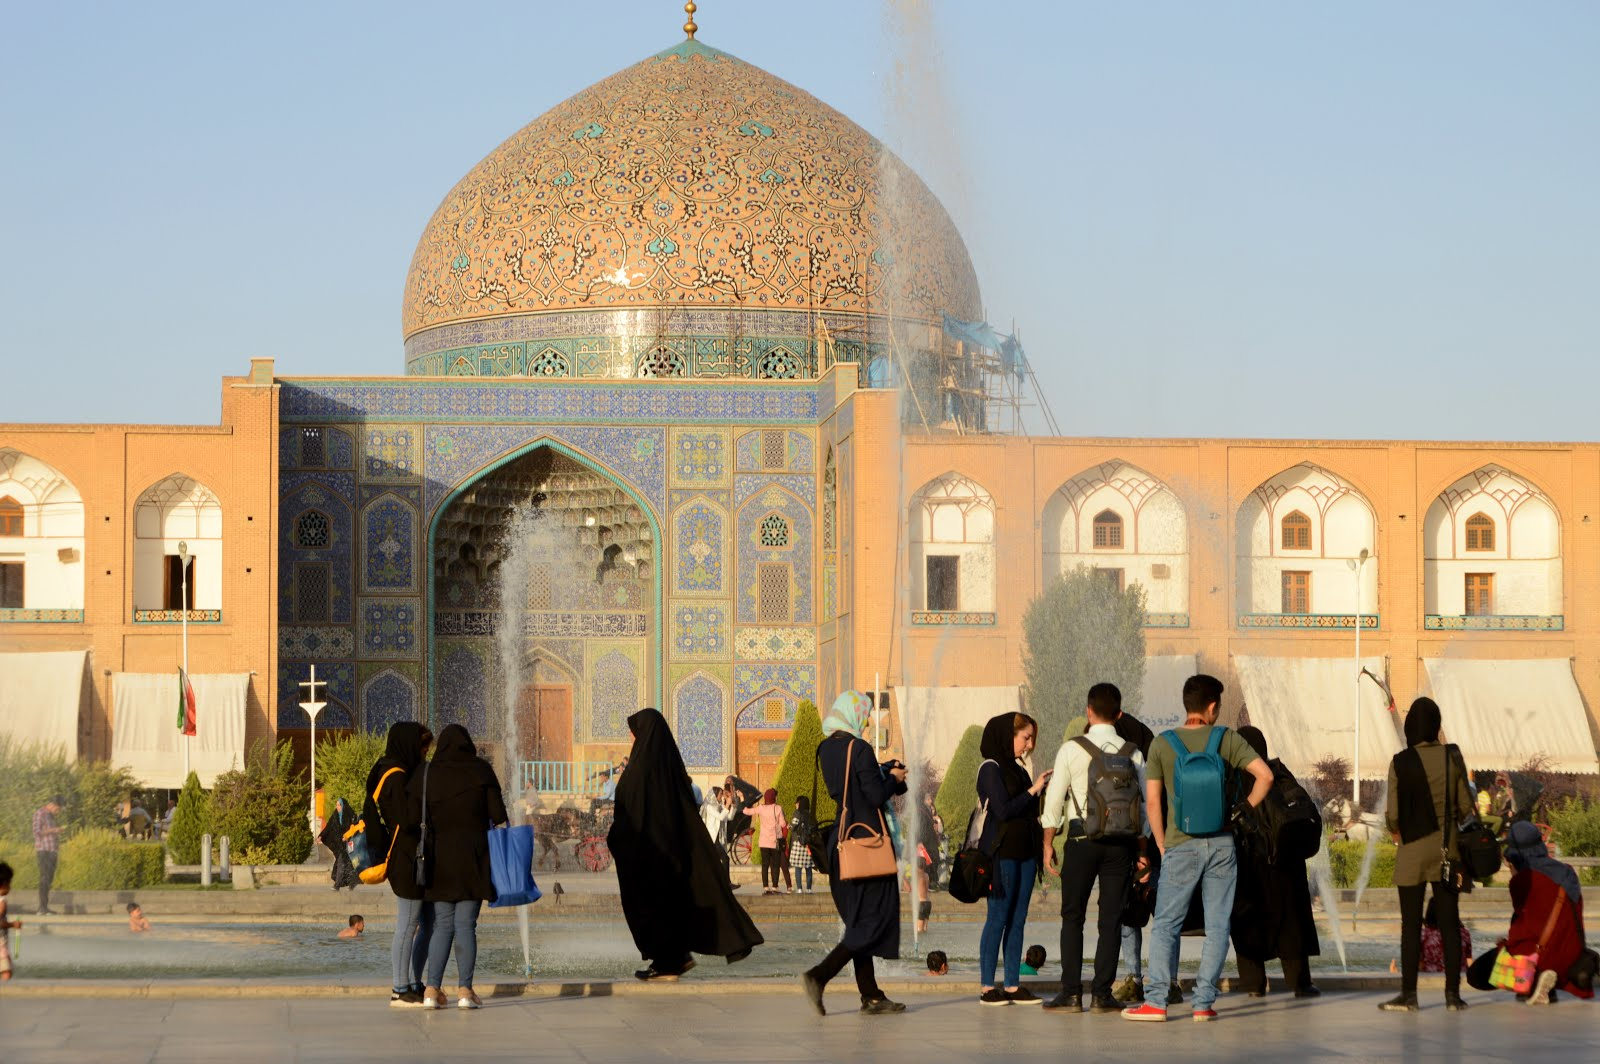 Imagen mezquita de Irán